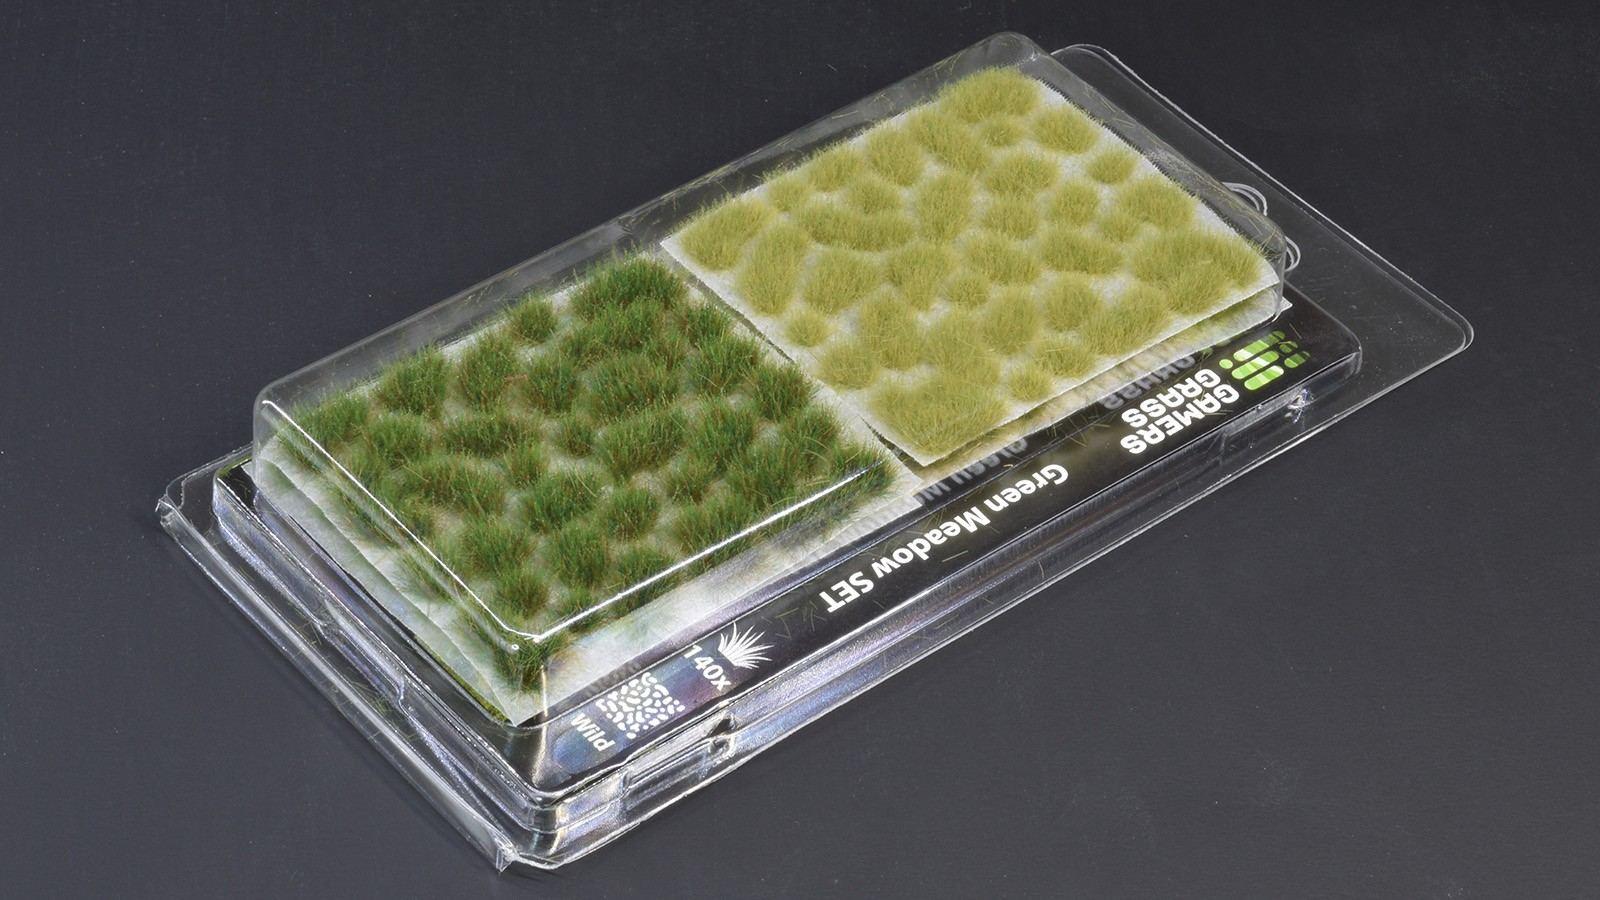 Green Meadow Set Blister